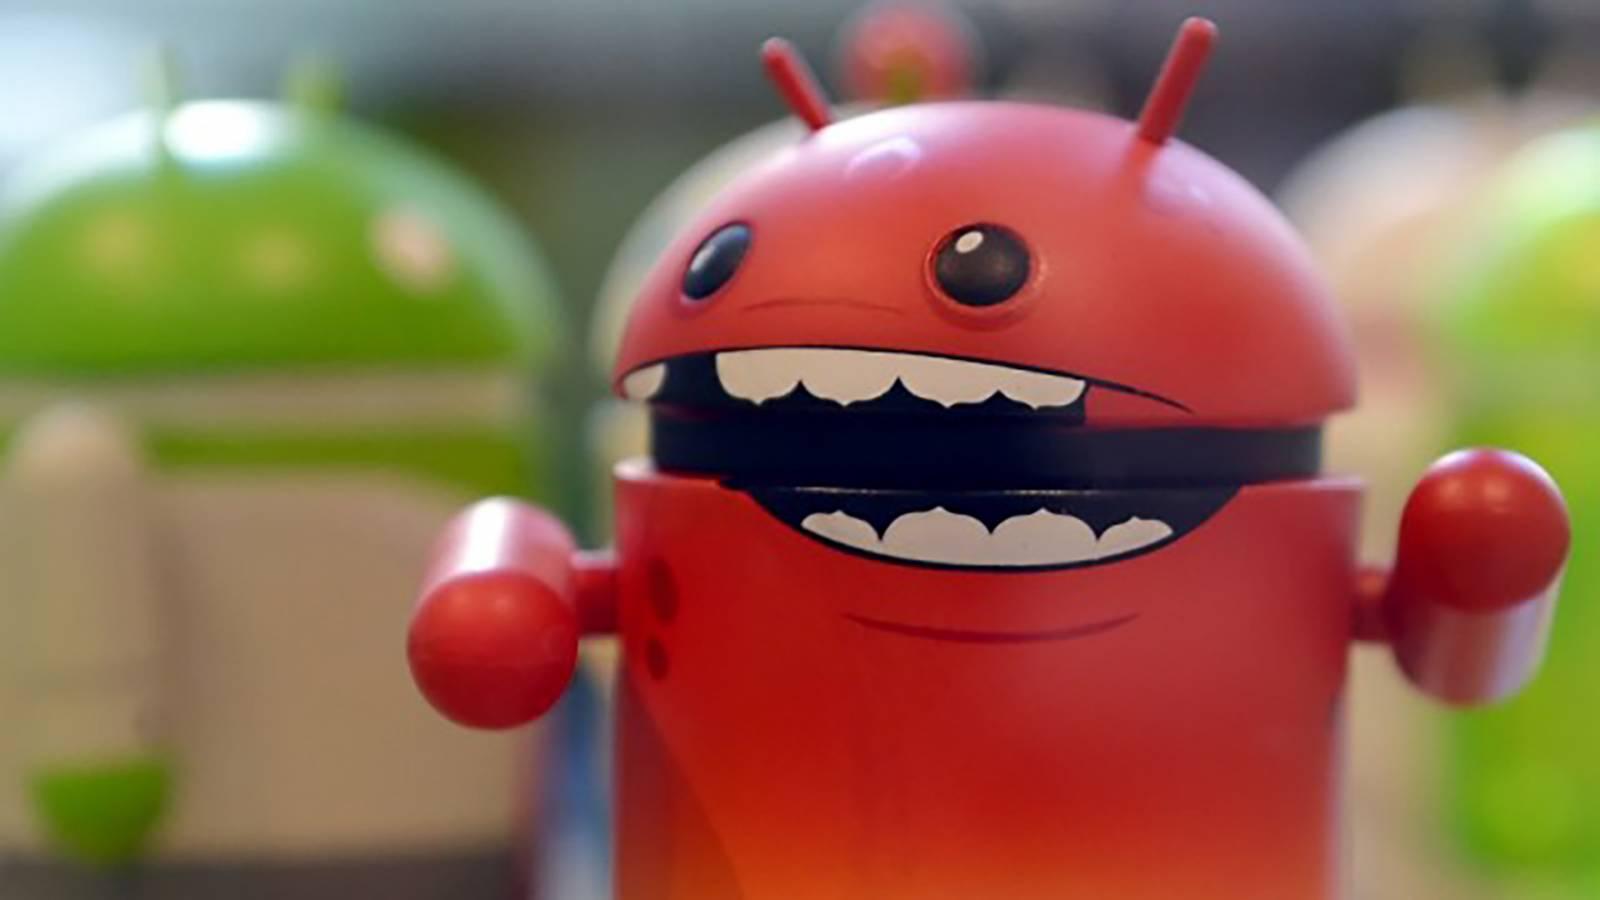 Android inserare